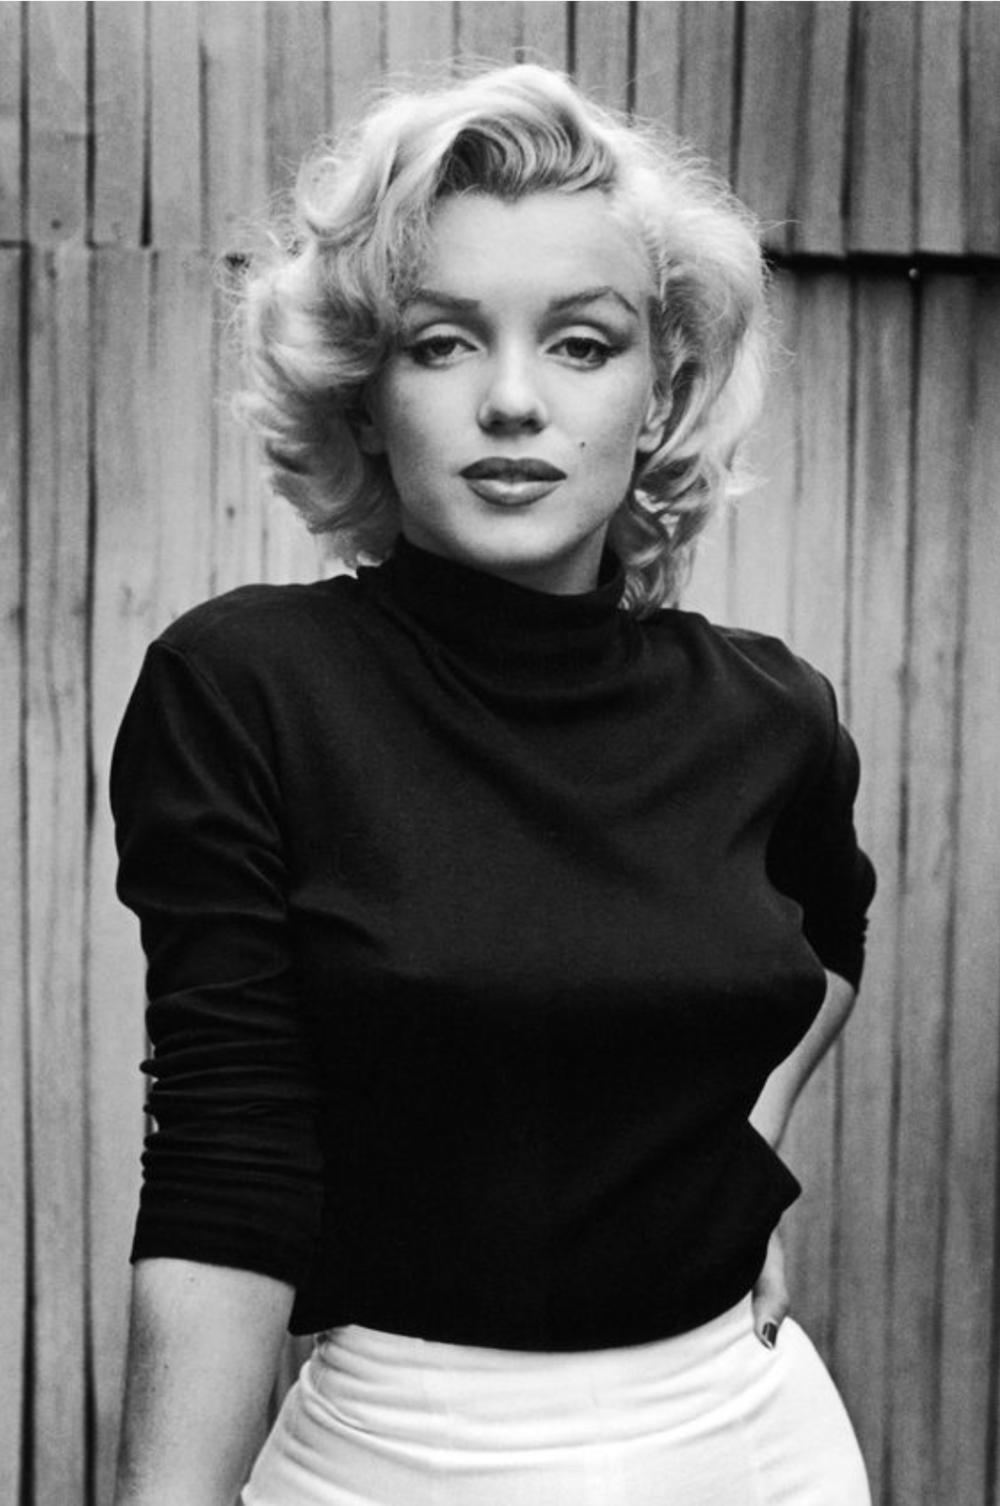 Marilyn Monroe Black and White Fashion Photo